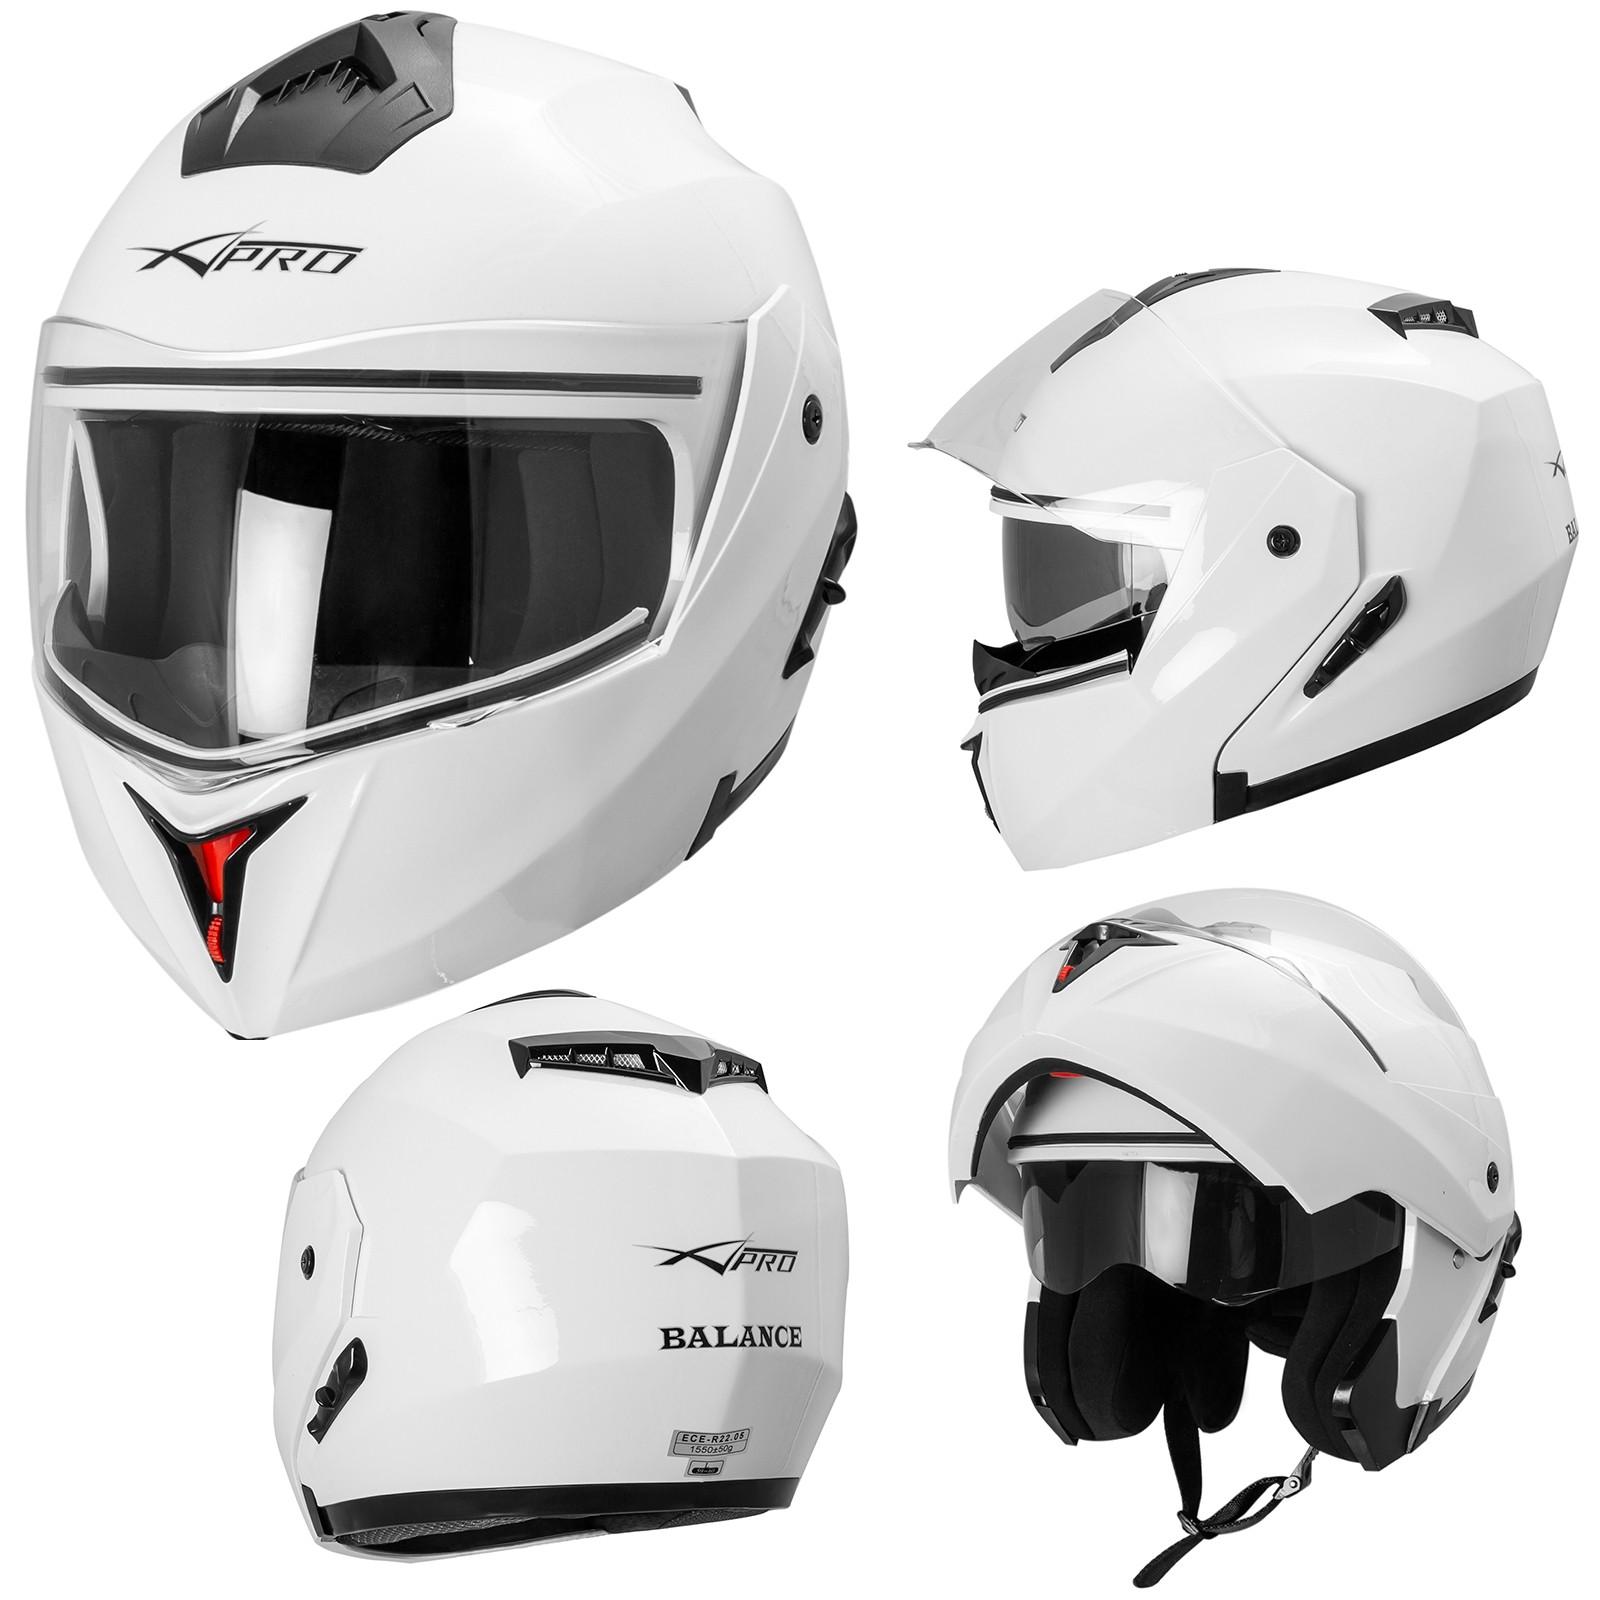 Balance-Casco-Helmet-Motorcycle-Bianco-White-Sonic-Moto-A-Pro-Compo